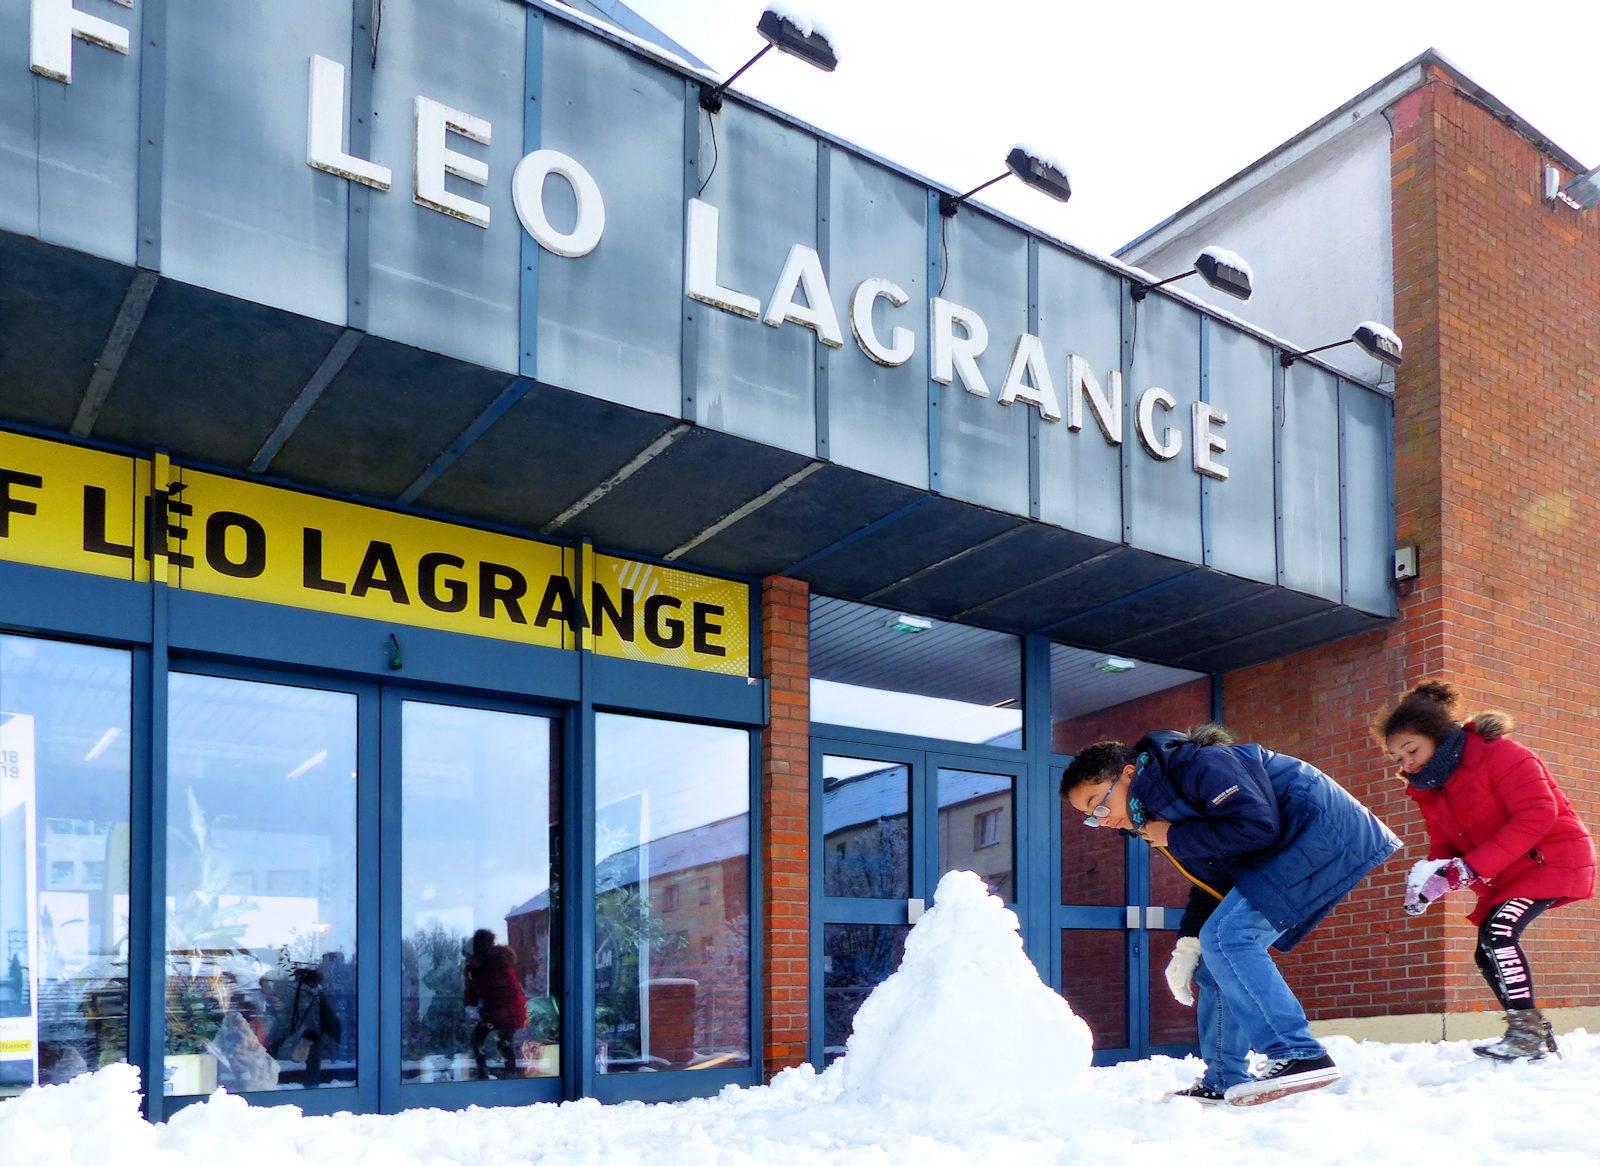 Bonhomme de neige devant Léo Lagrange